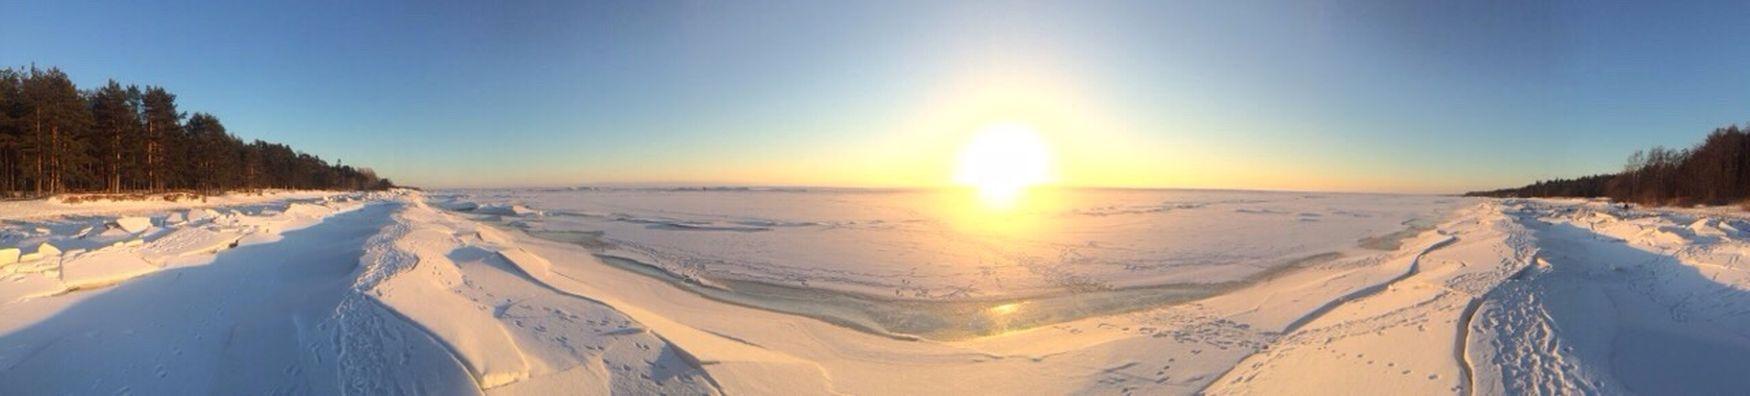 Dacha Komarovo Finlandbay Winter Wonderland Snow Ice